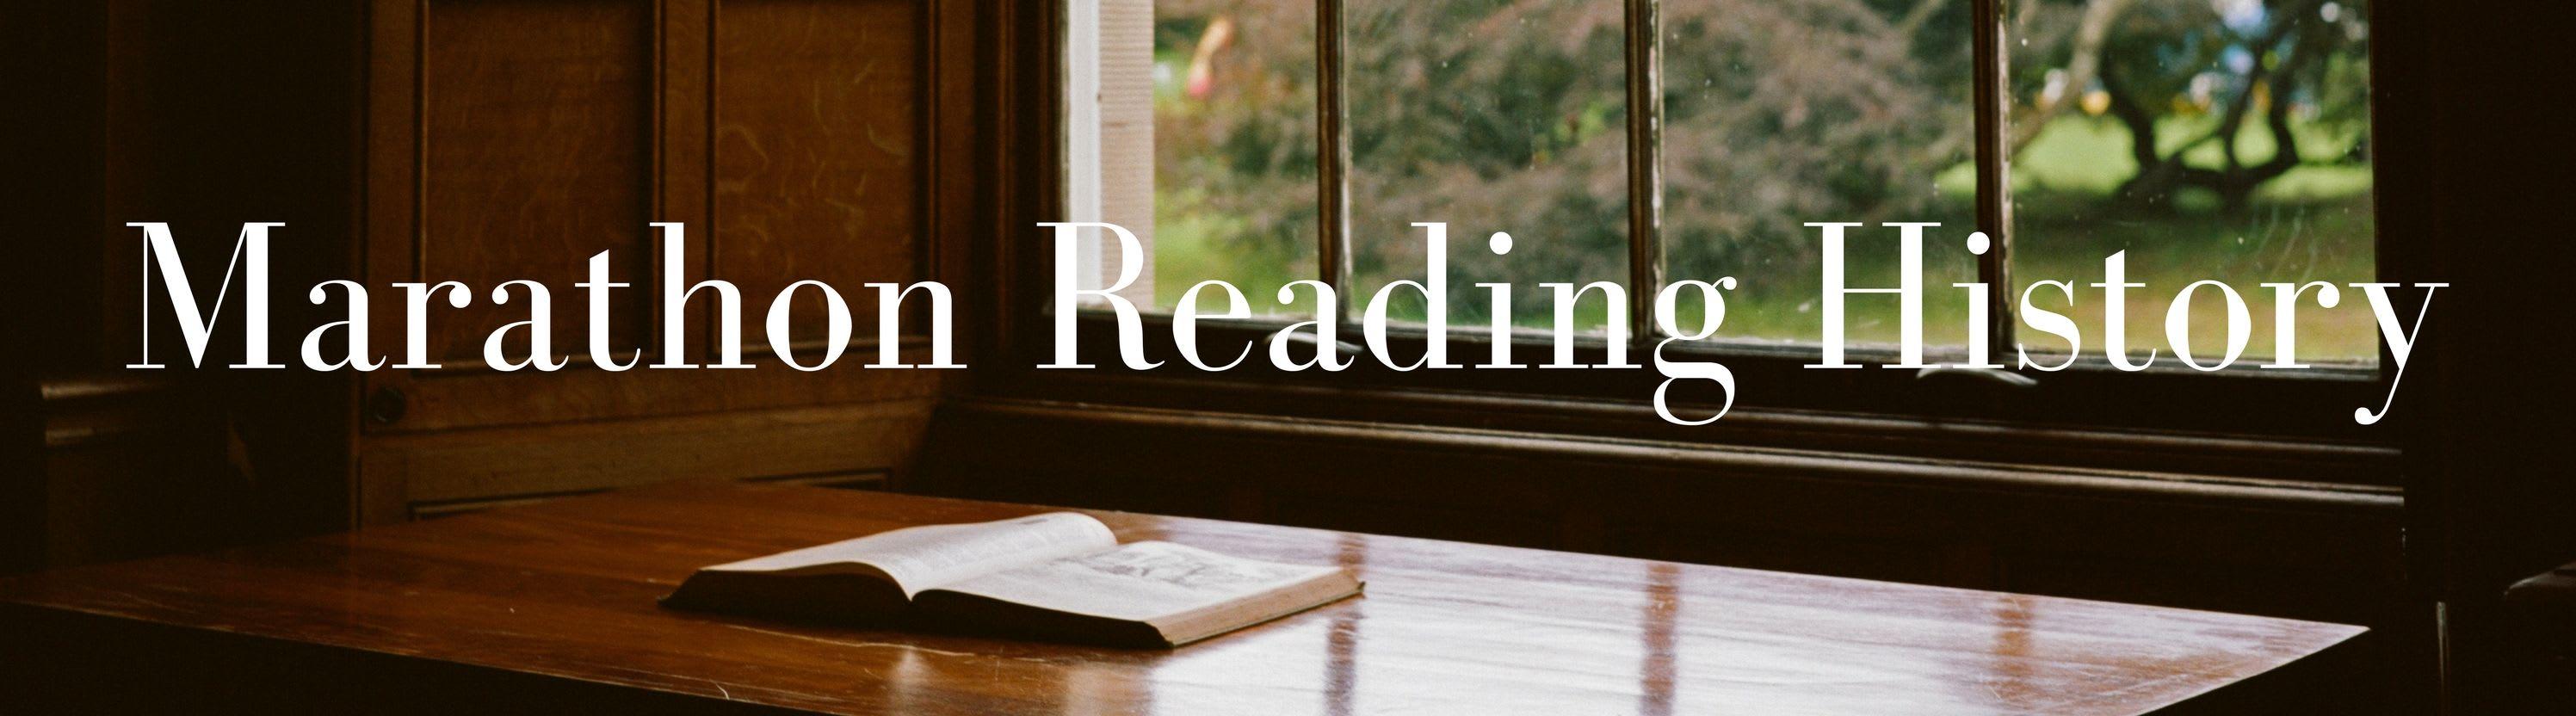 Marathon Reading History